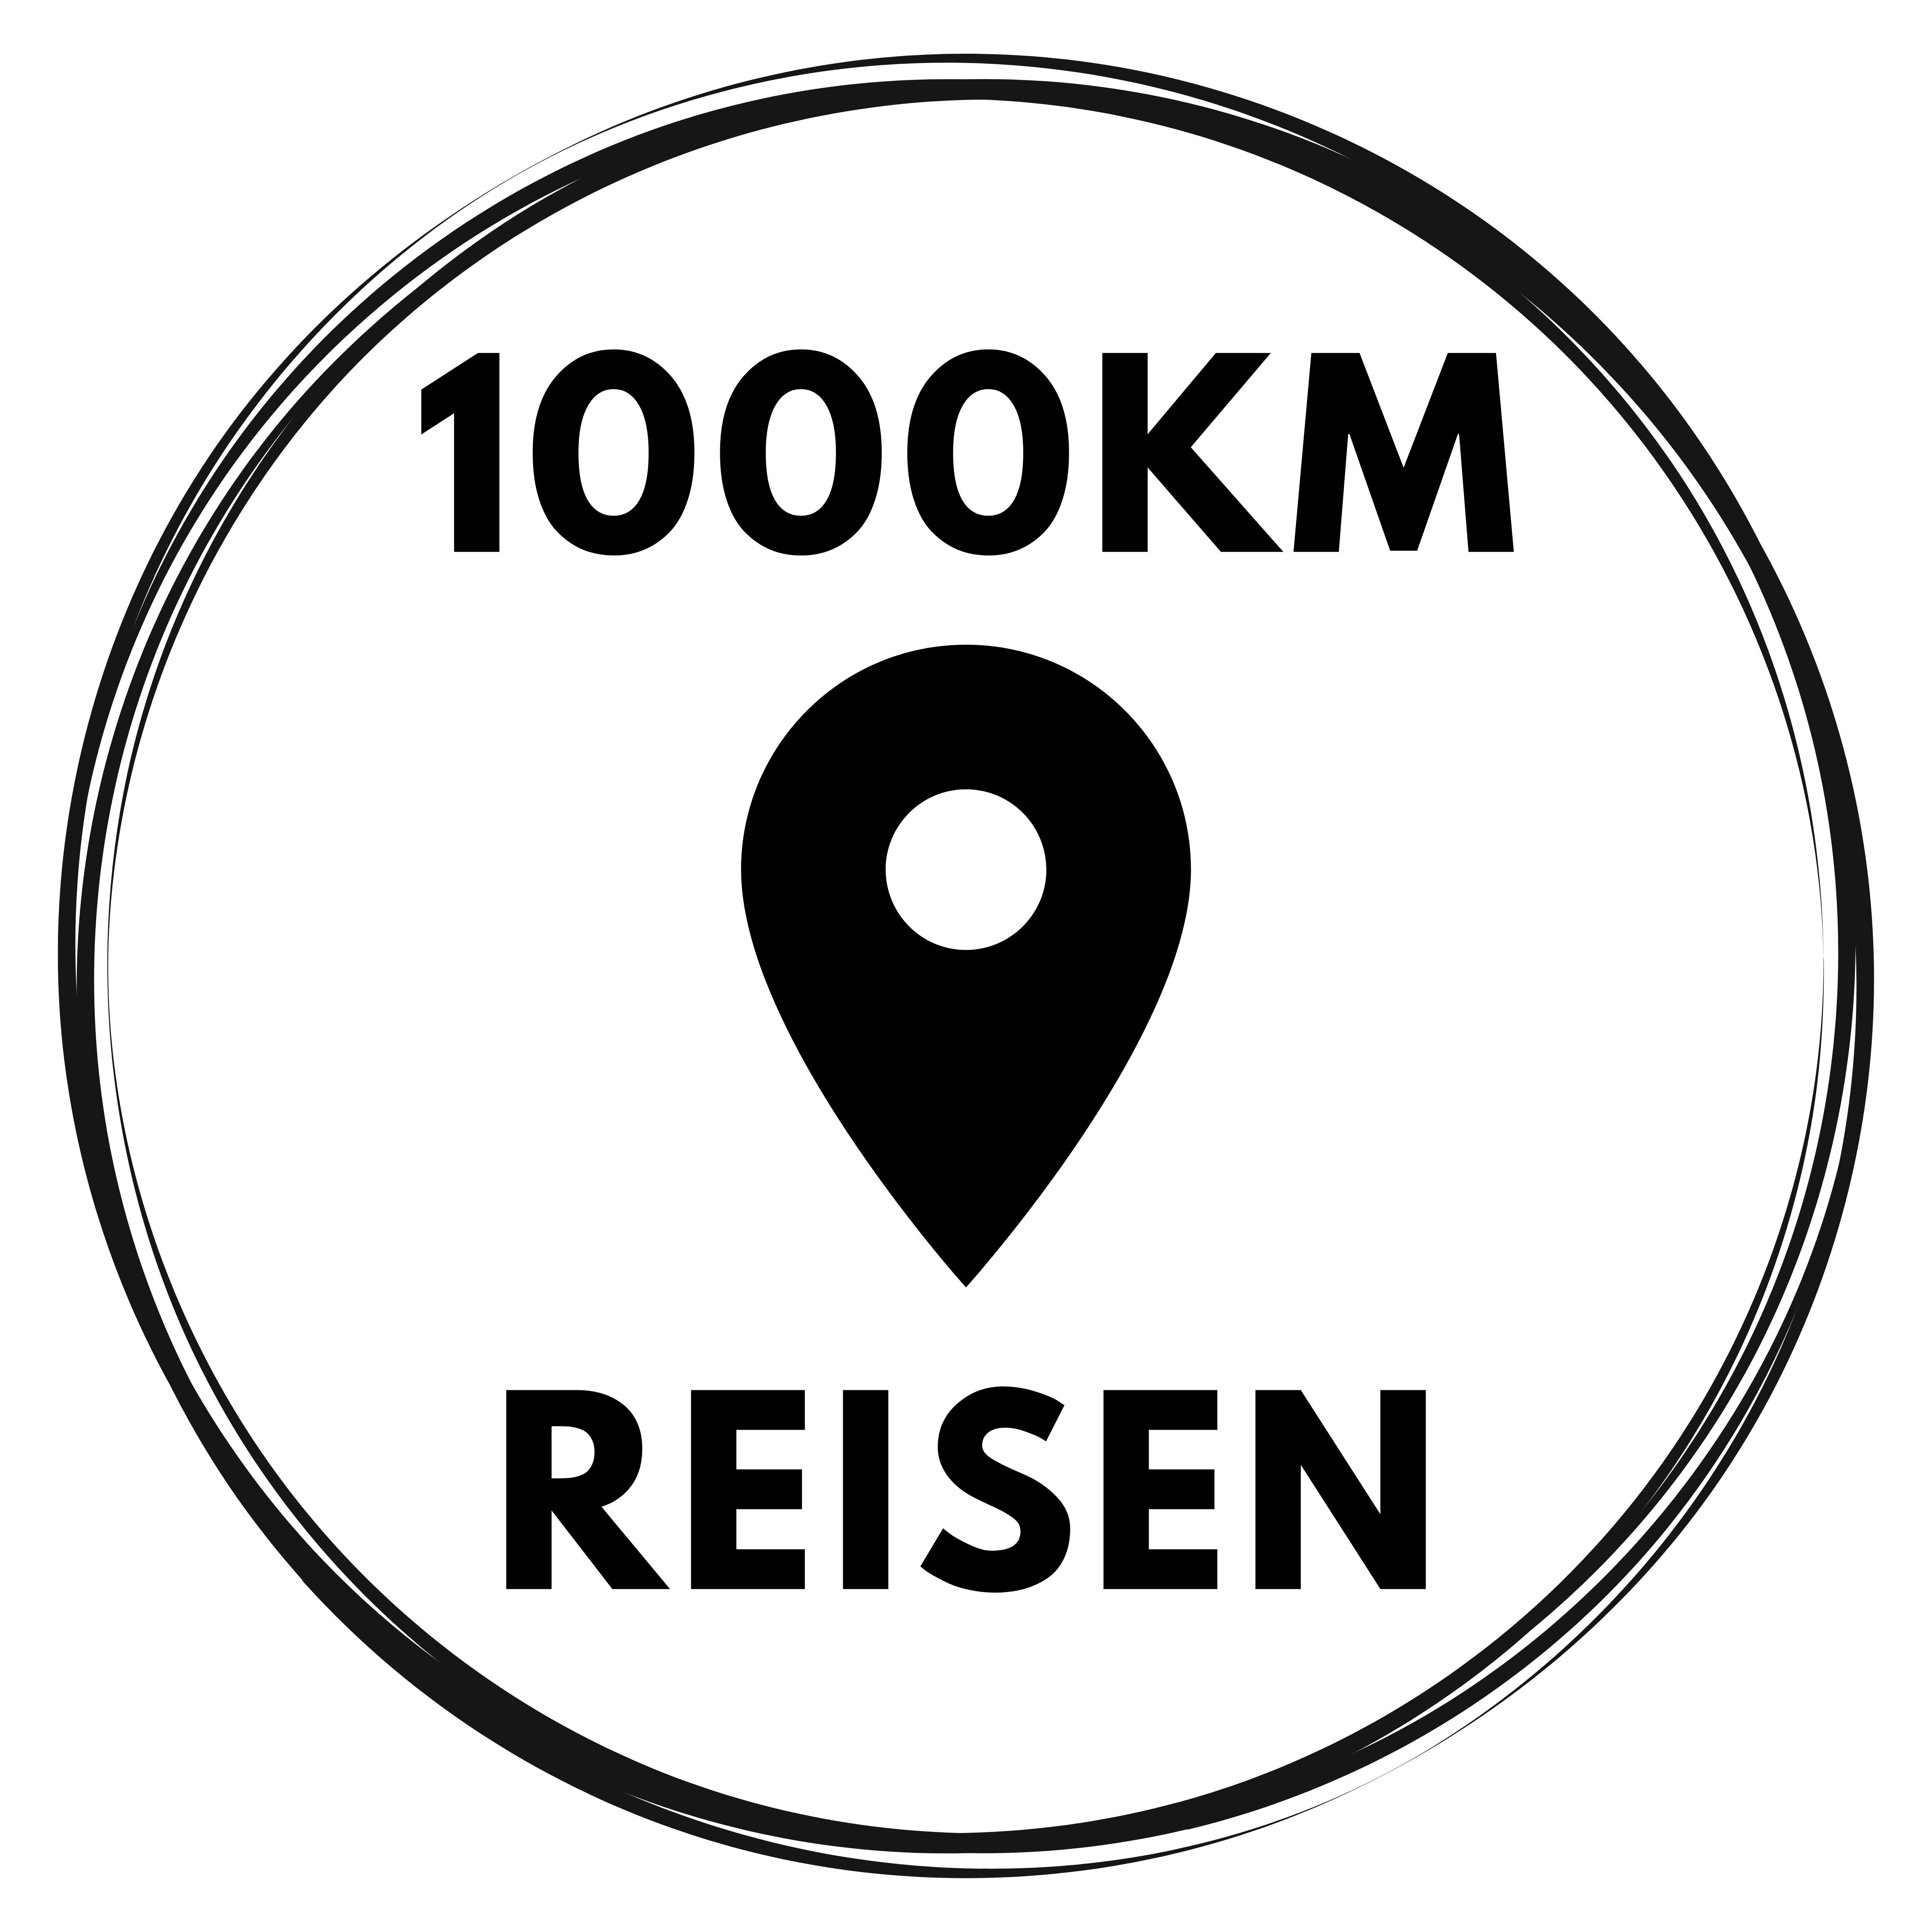 1000KM Reisen Logo